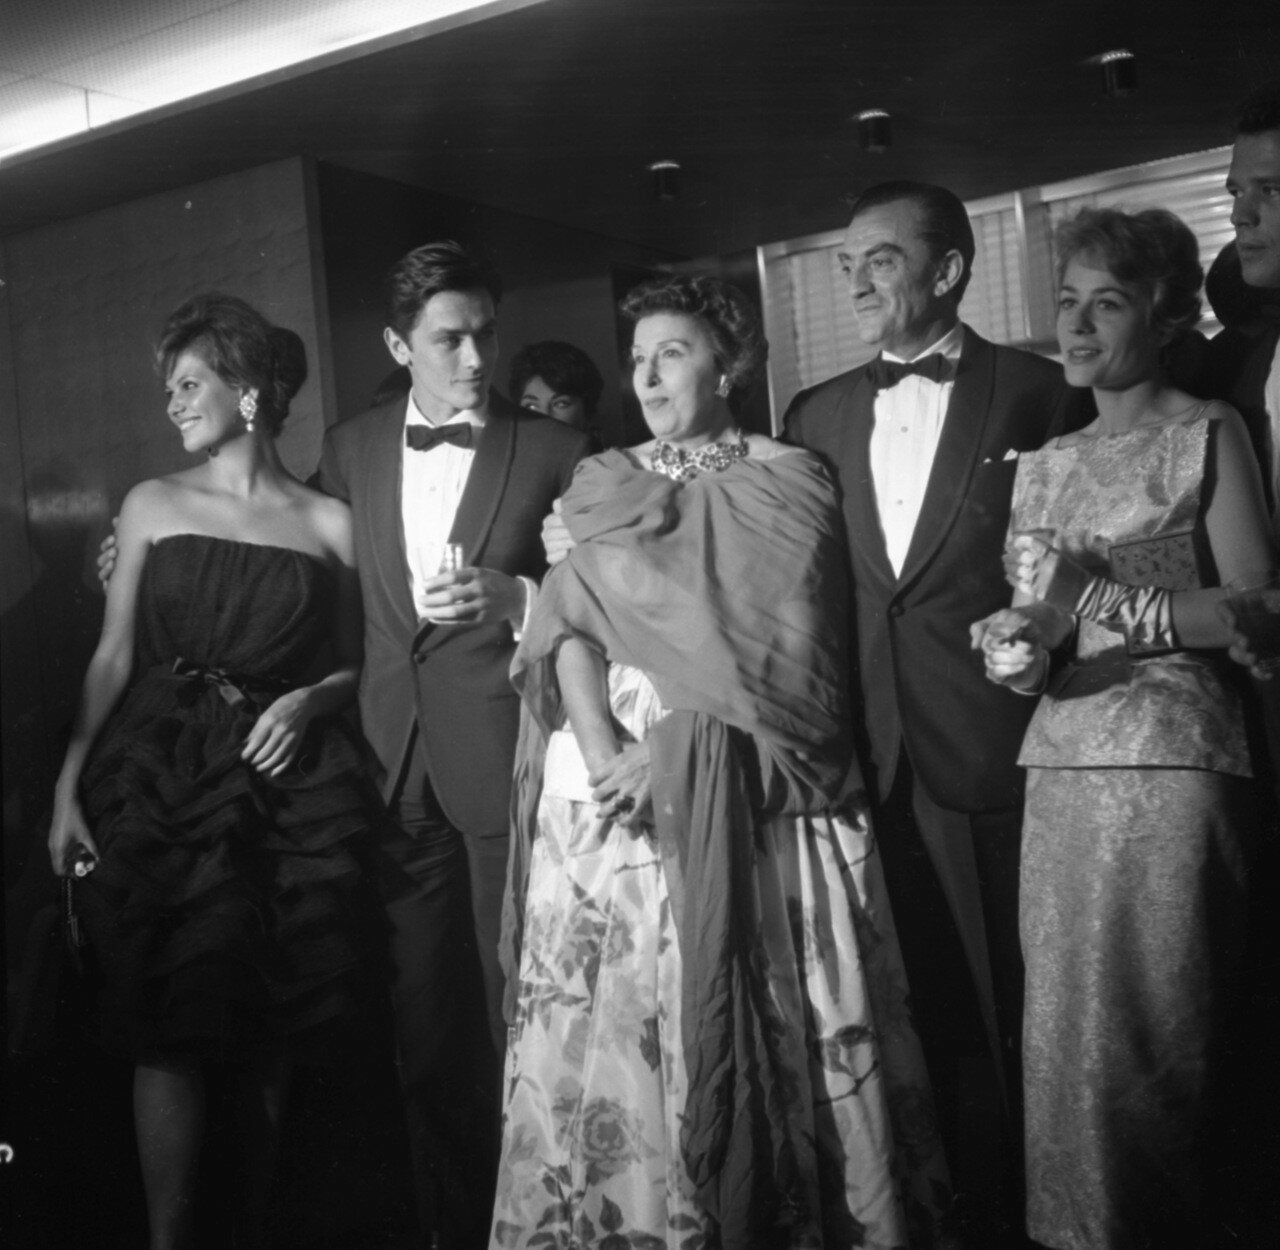 1960. Показ «Рокко и его братья» на Венецианском кинофестивале. На снимке Клаудия Кардинале, Ален Делон, Катина Паксино, Лукино Висконти и Анни Жирардо